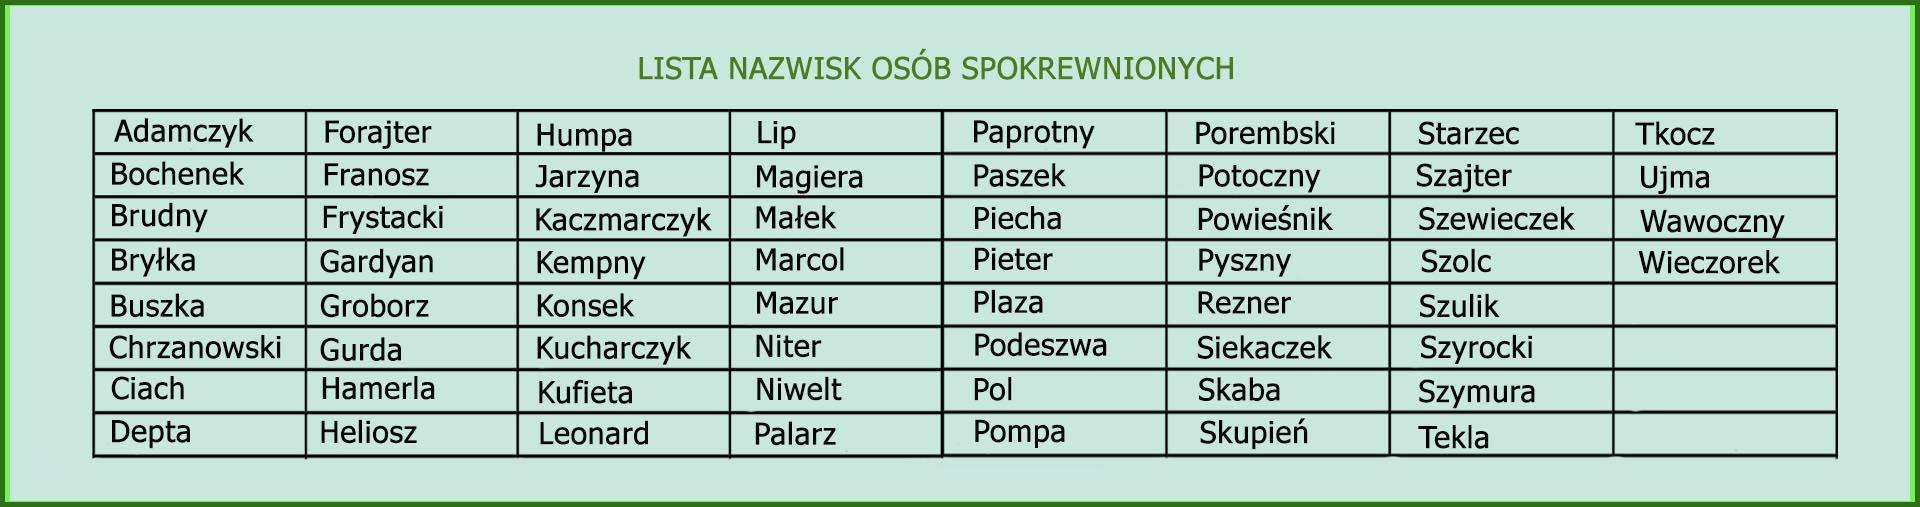 Lista nazwisk OSÓB SPOKREWNIONYCH.jpg (198 KB)